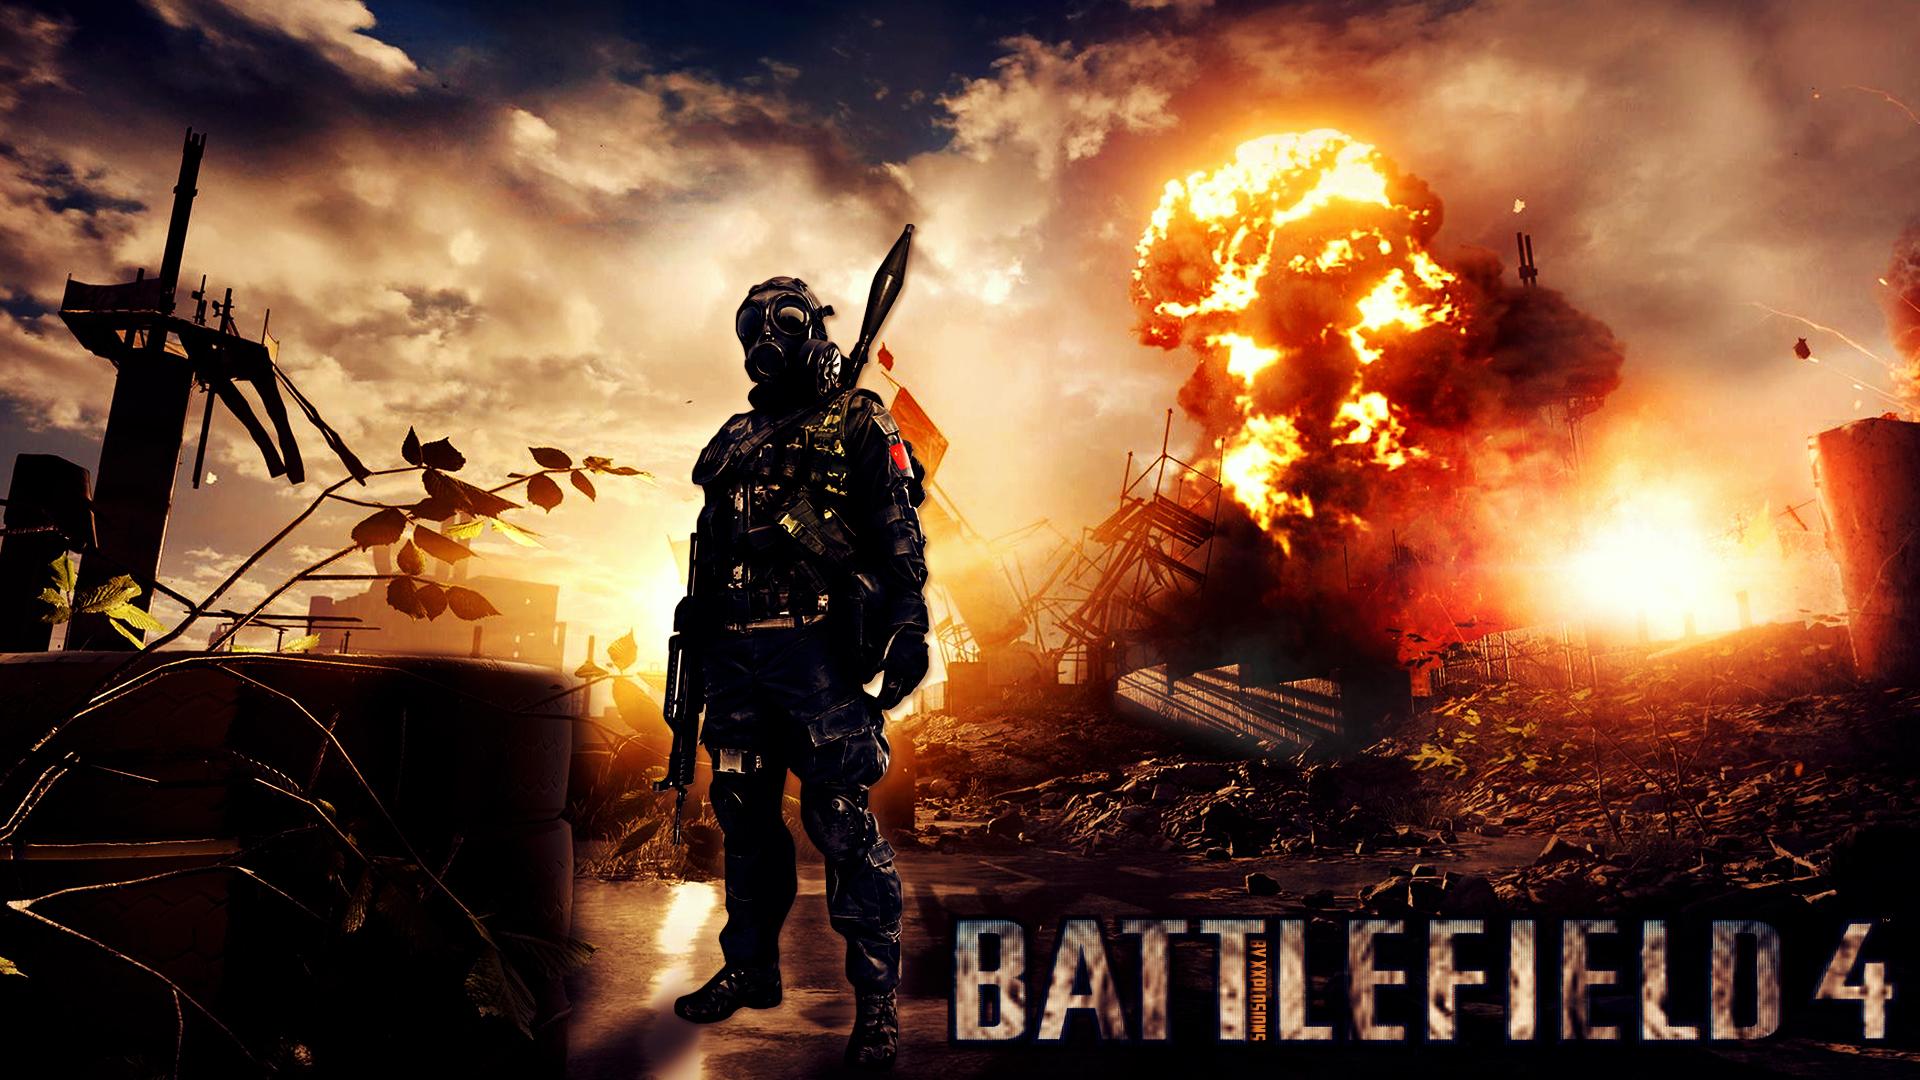 Battlefield 4 Wallpapers Best Wallpapers 1920x1080